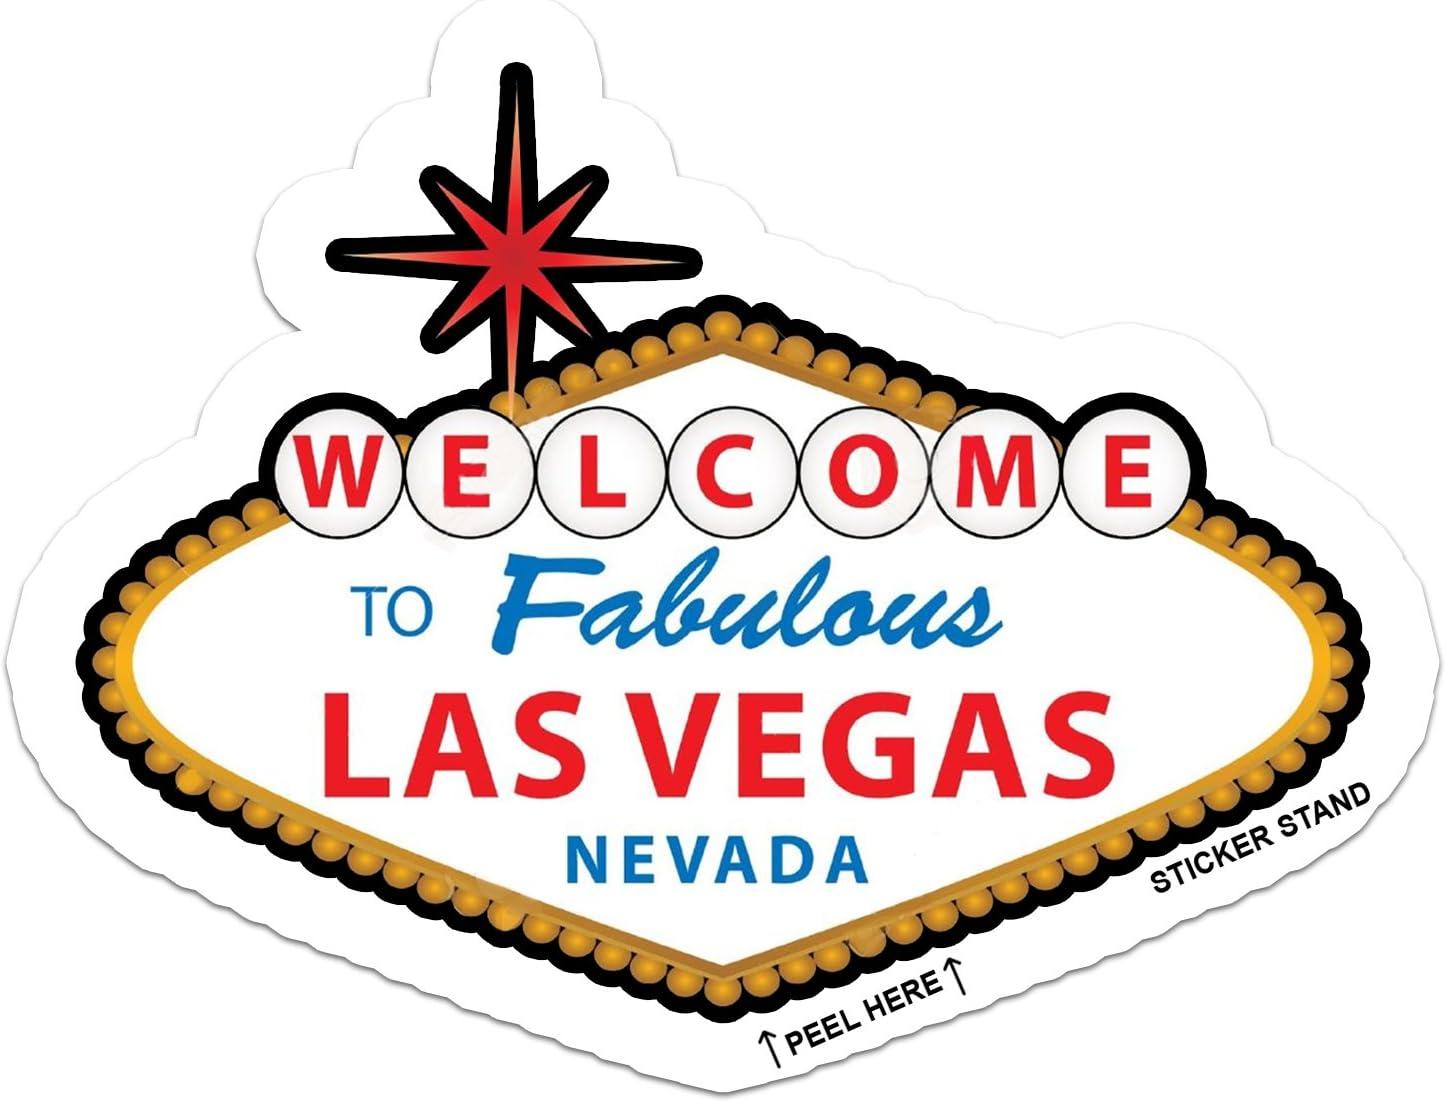 Las Vegas Nevada car bumper sticker decal 5